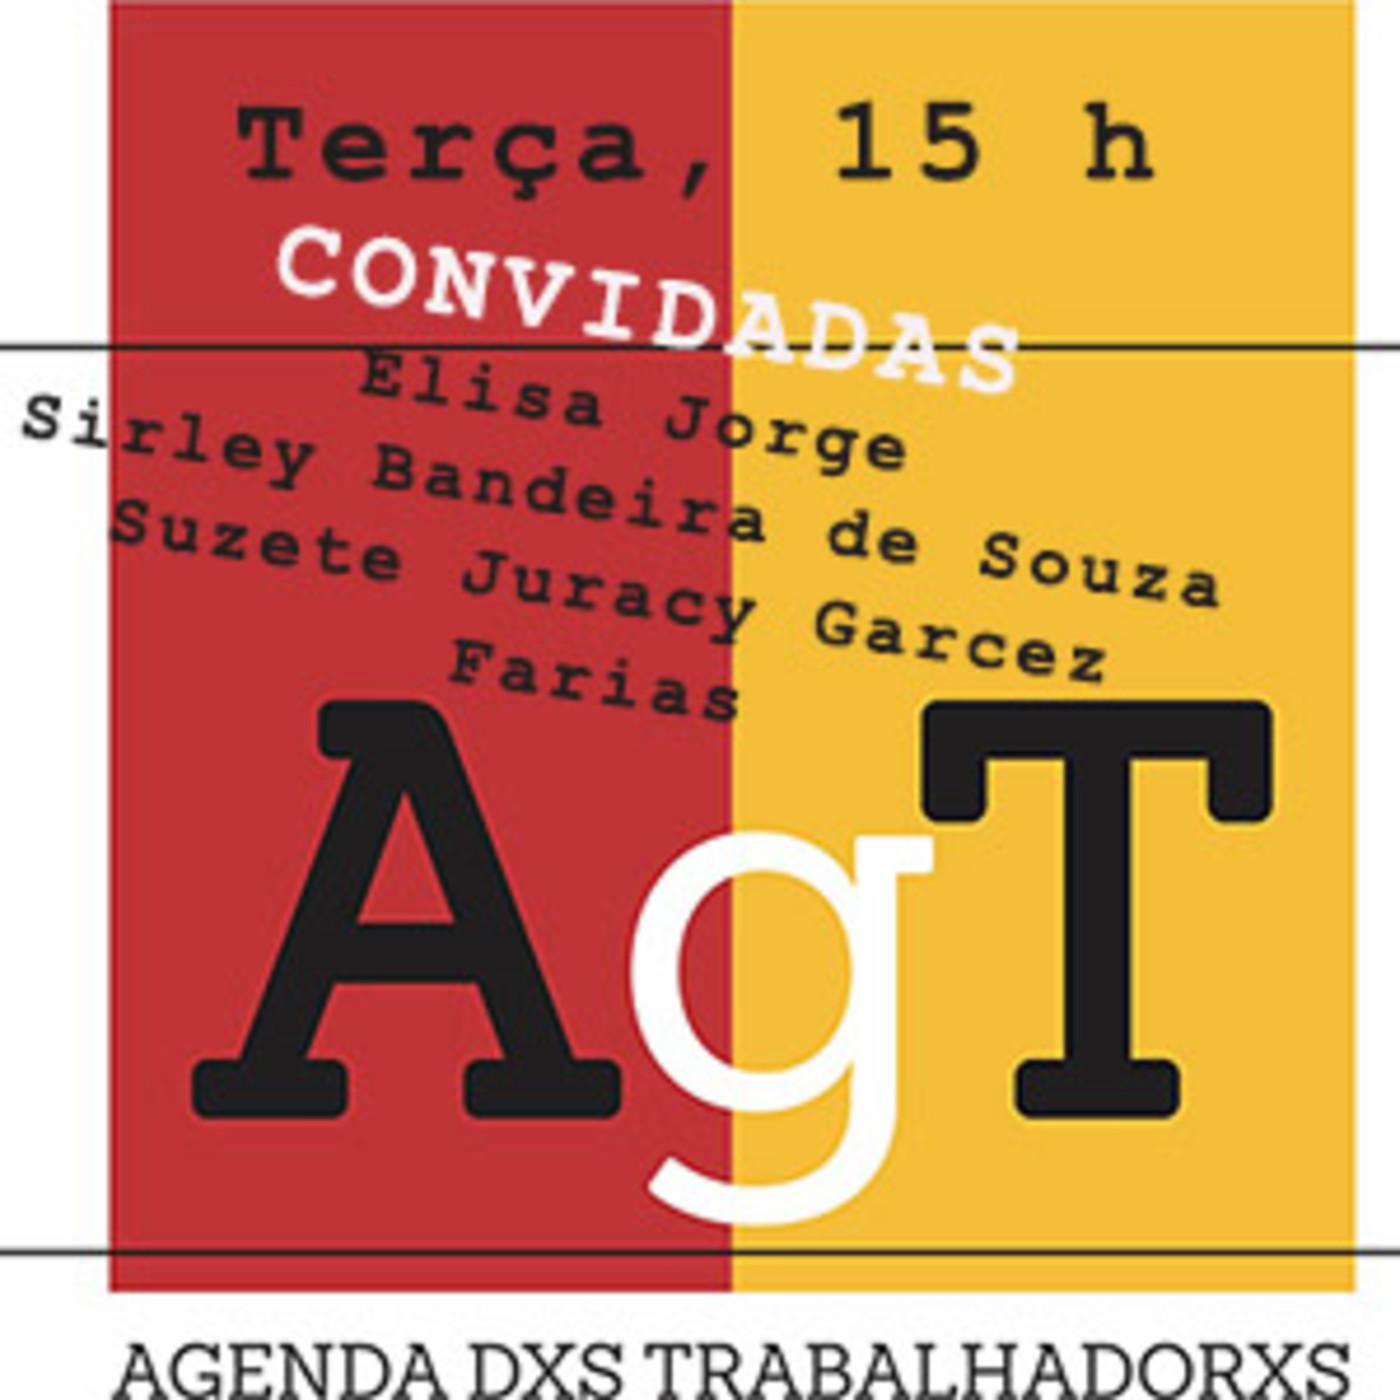 Trajetórias de lutas: Elisa Jorge, Sirley Bandeira de Souza e Suzete Juracy Garcez Farias